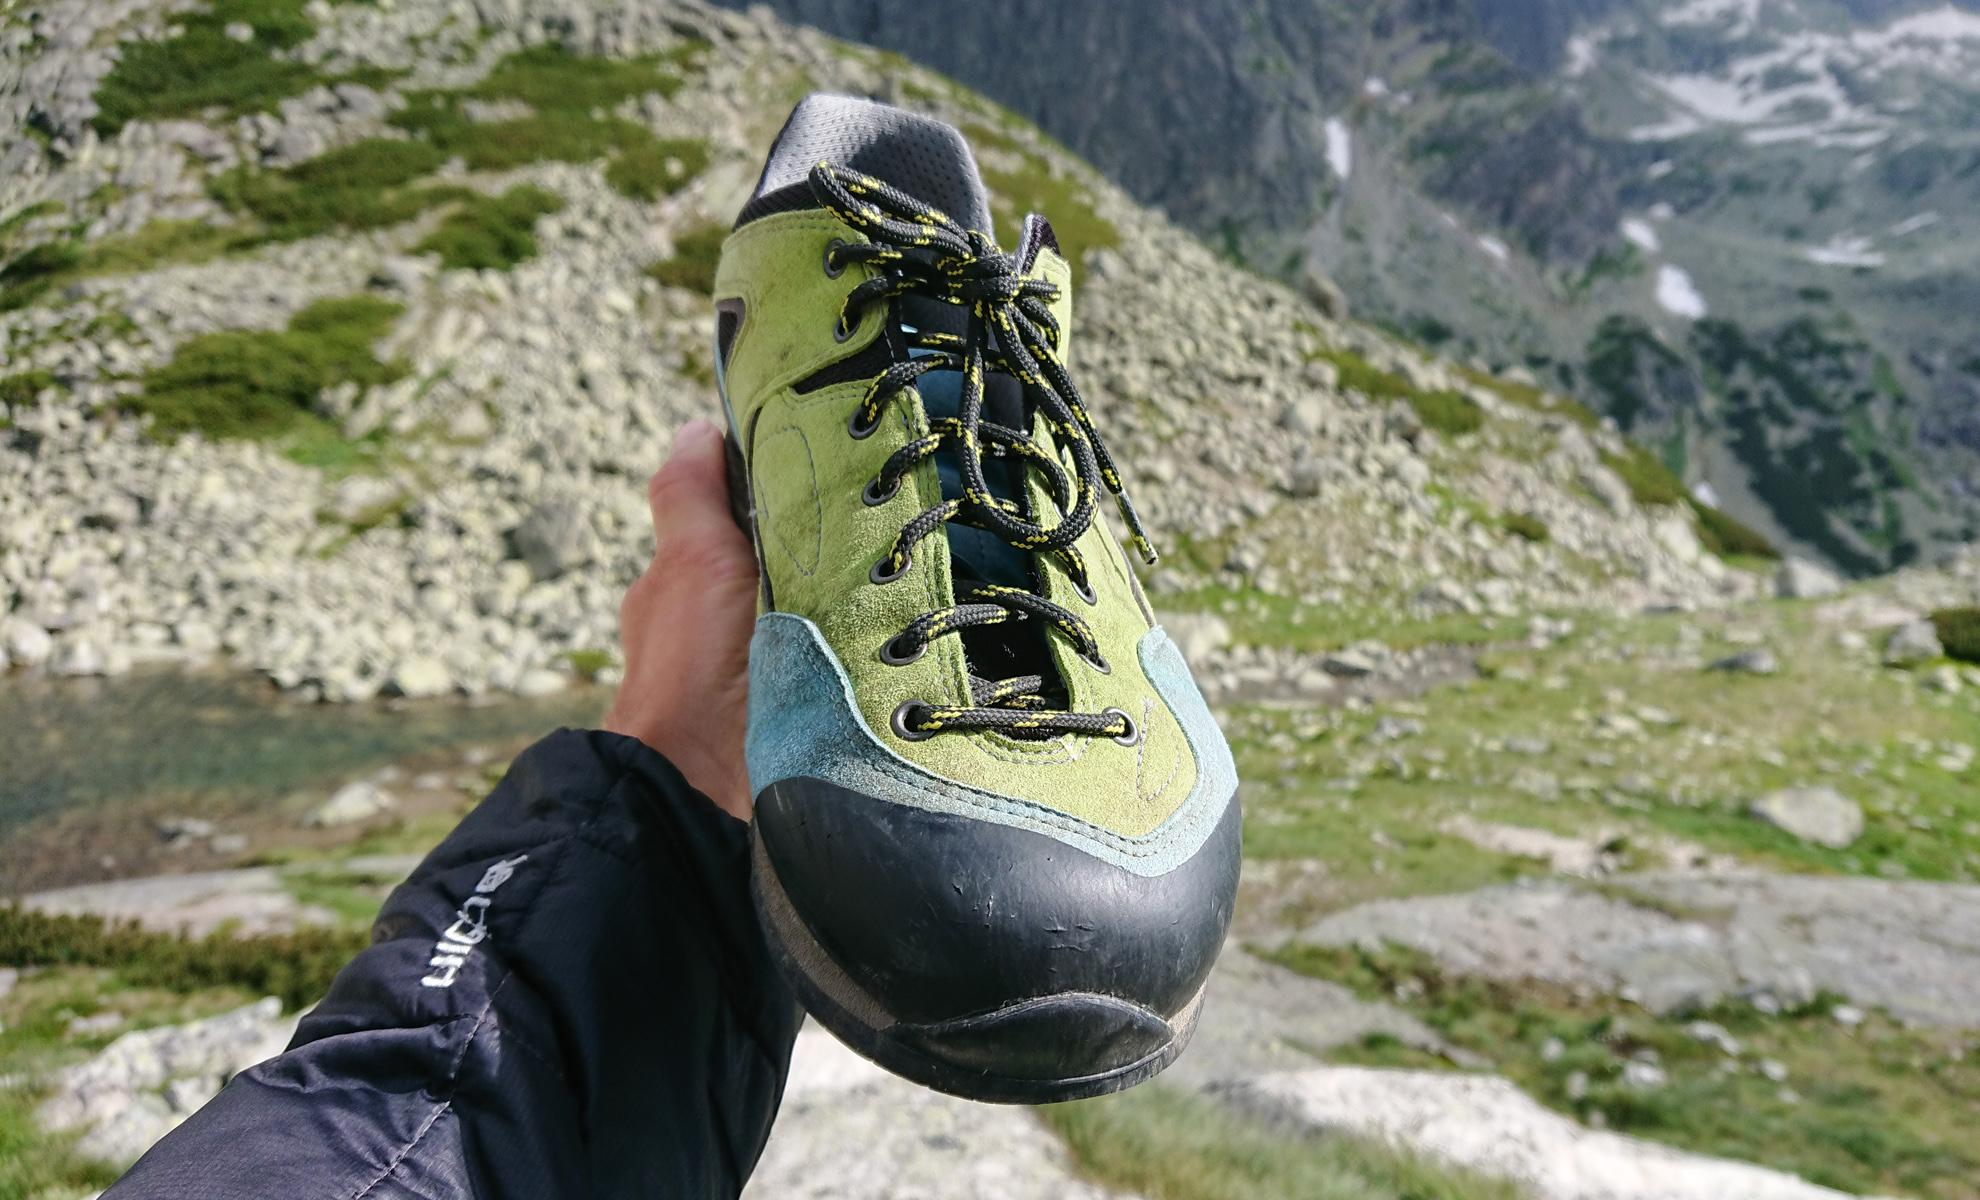 Bosp Grifit trekingové topánky vhodné aj na nástupy do Tatier